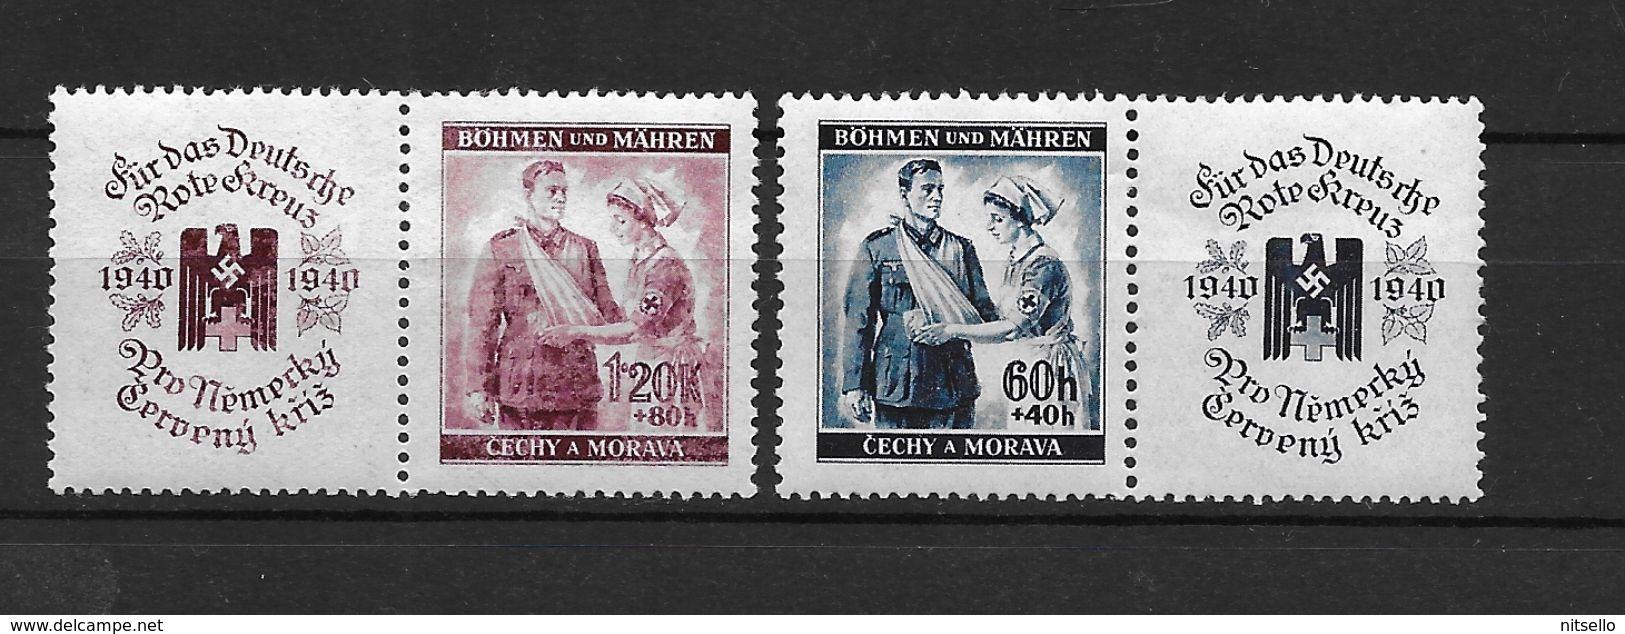 LOTE 1661  ///  BOHEMIA Y MORAVIA   YVERT Nº: 39/40 - Bohemia & Moravia